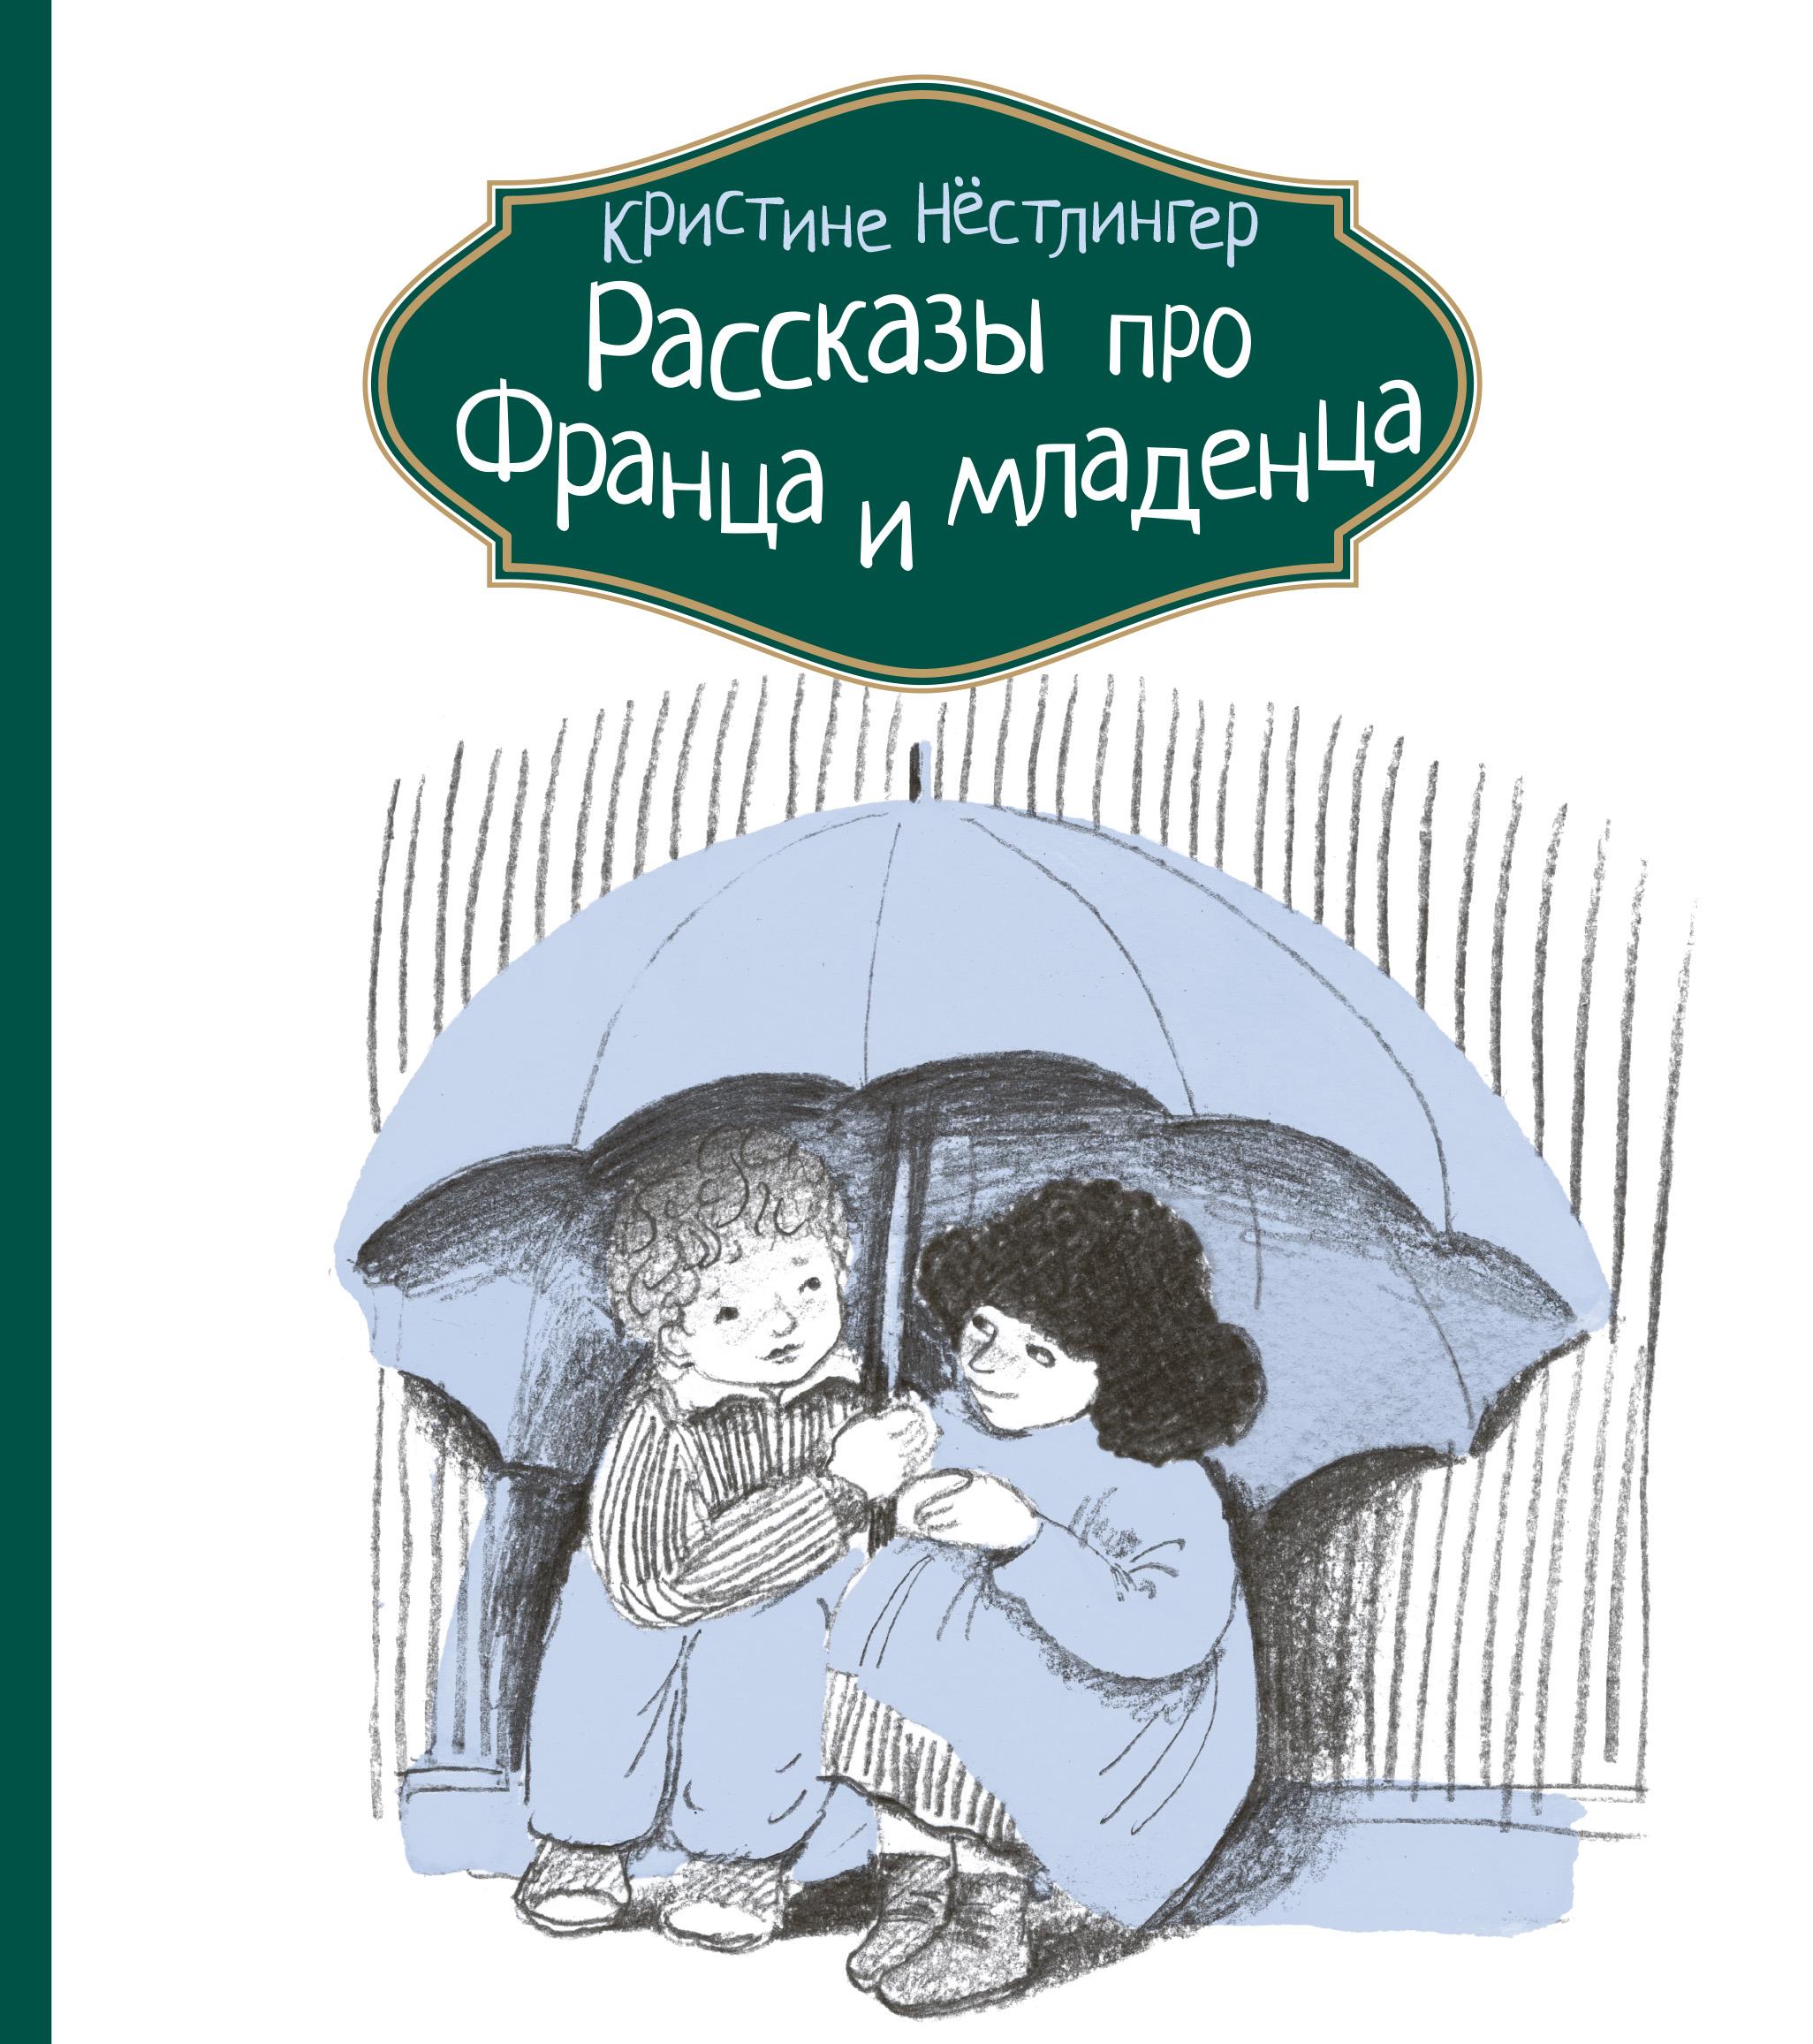 Кристине Нёстлингер Рассказы про Франца и младенца кристине нёстлингер рассказы про франца